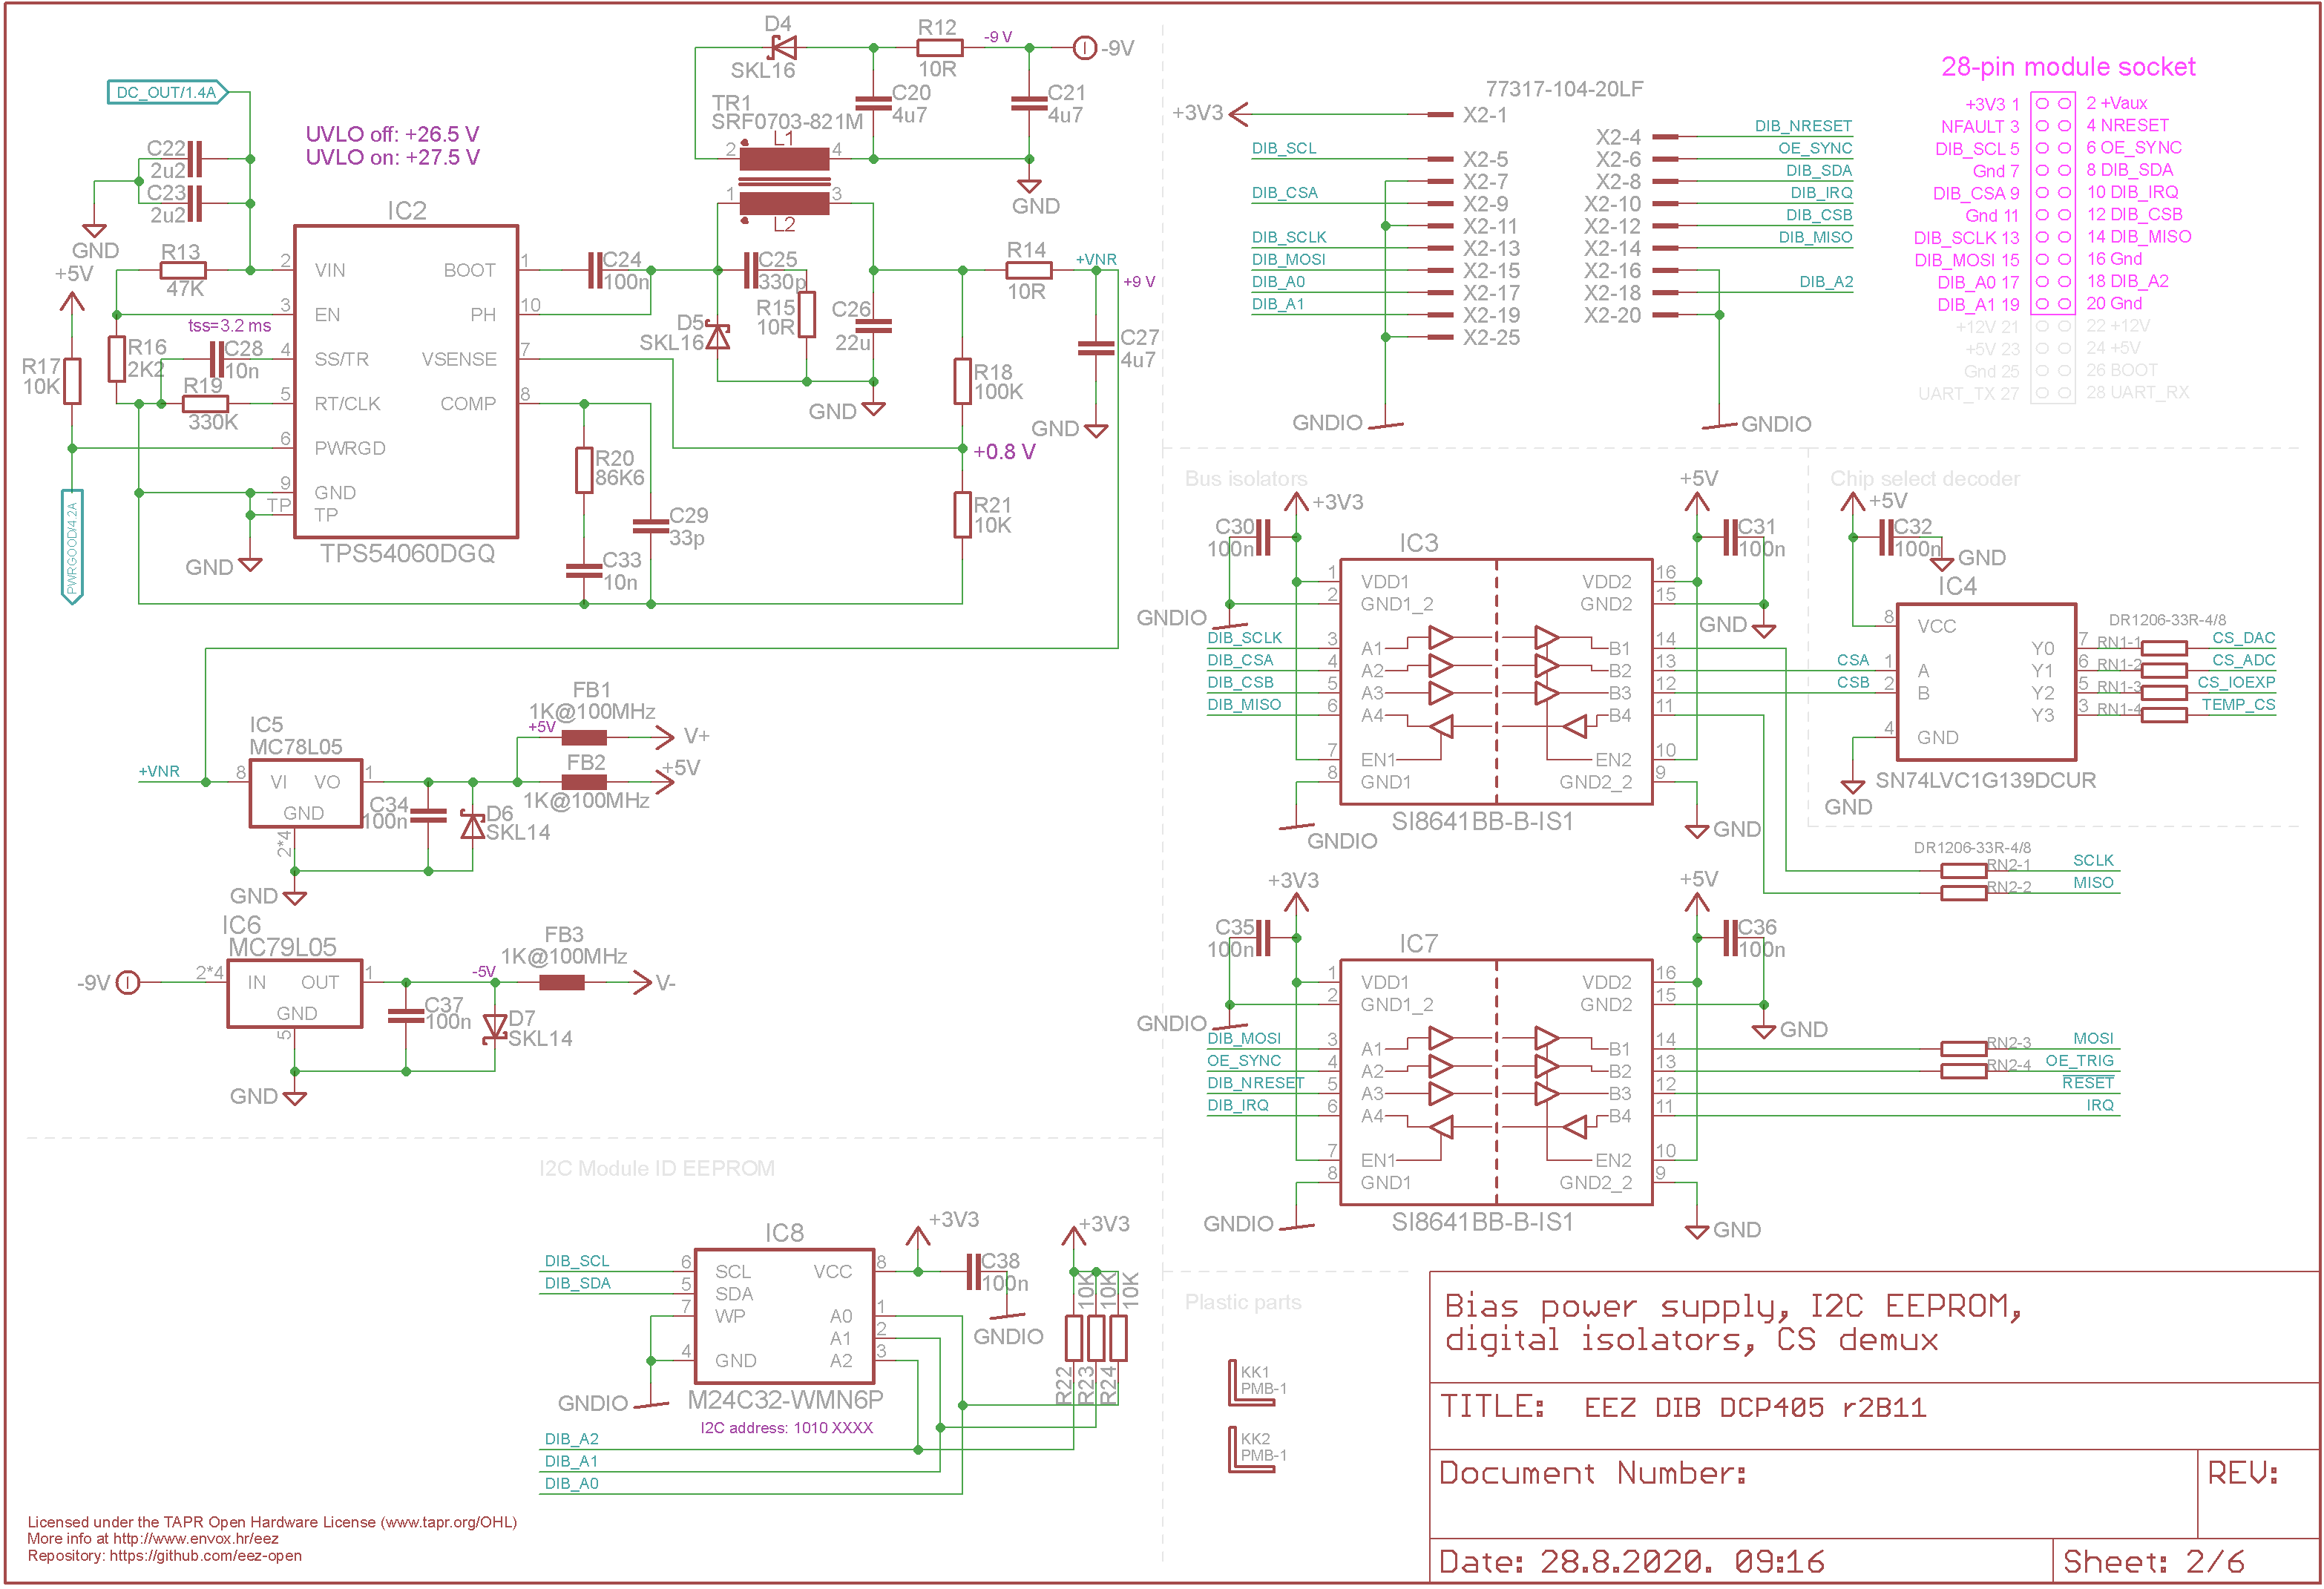 eez_dcp405_r2b11_sheet2of6.png